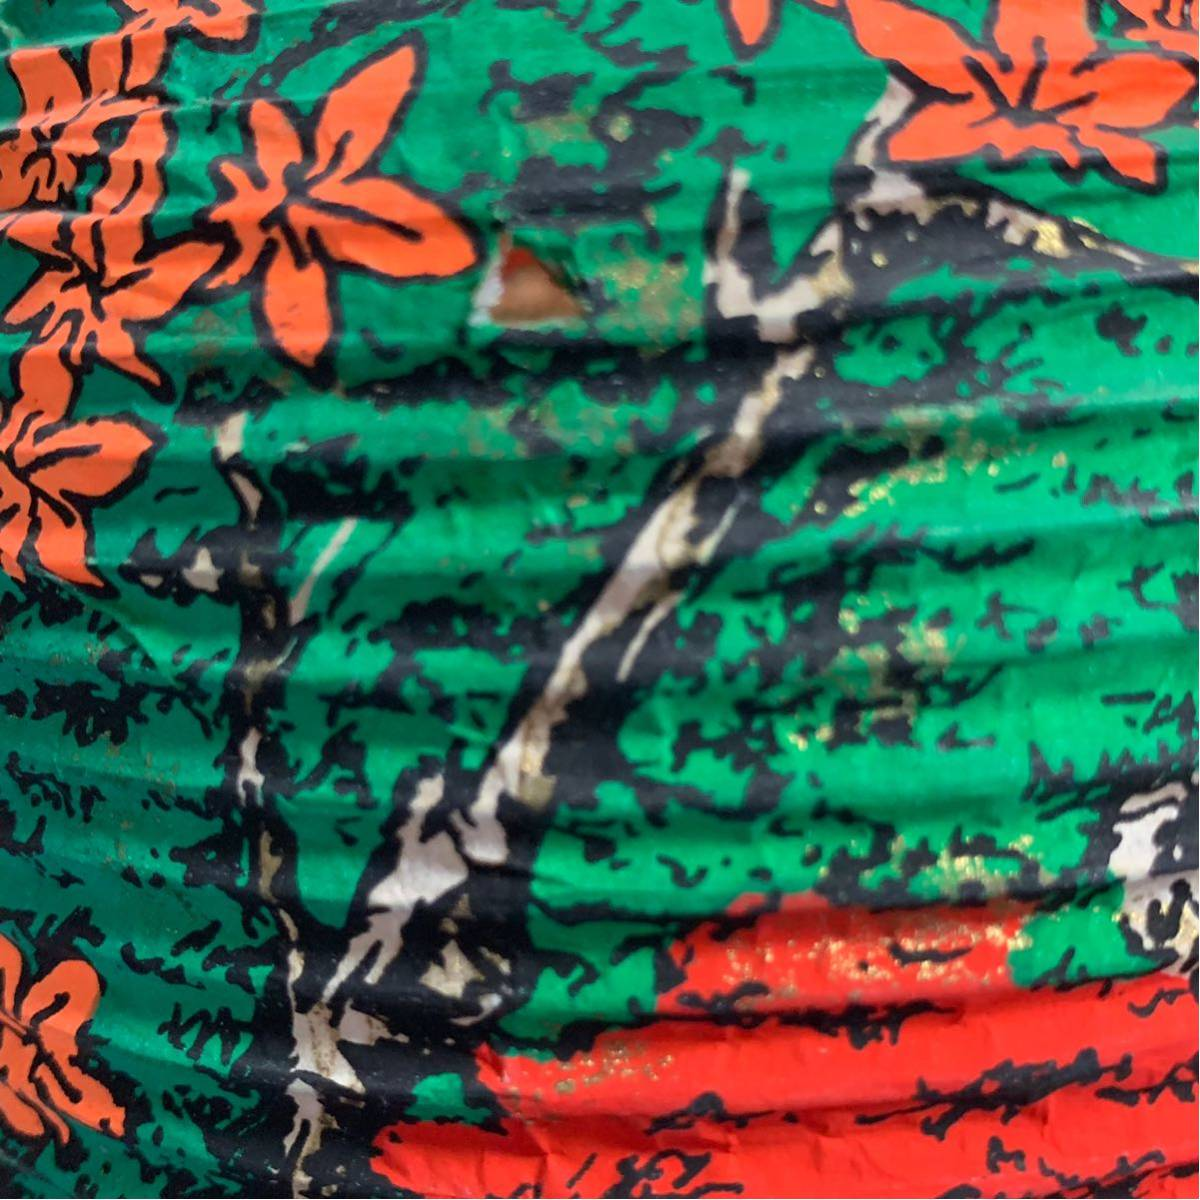 昭和 レトロ 民芸 観光 土産 ご当地 提灯 山口県 秋芳洞 秋吉台_画像4